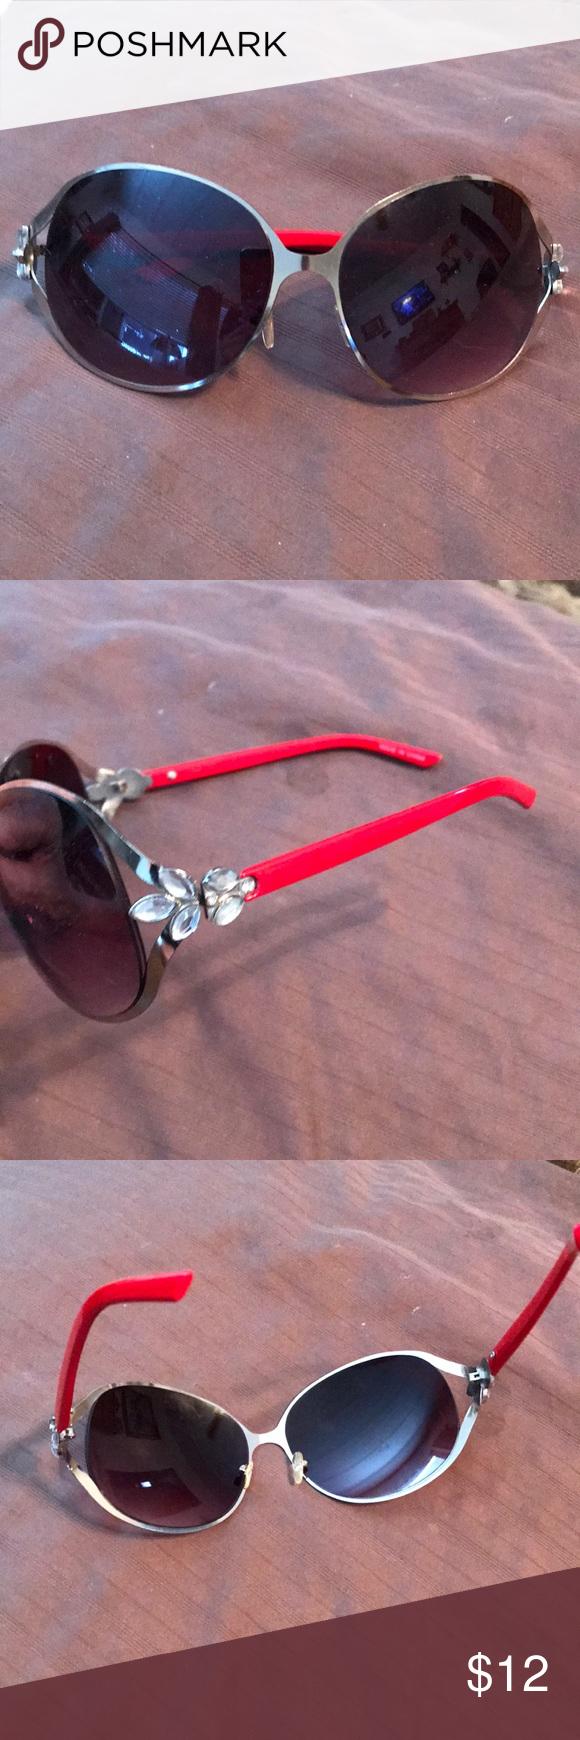 NWOT Fashion Sunglasses